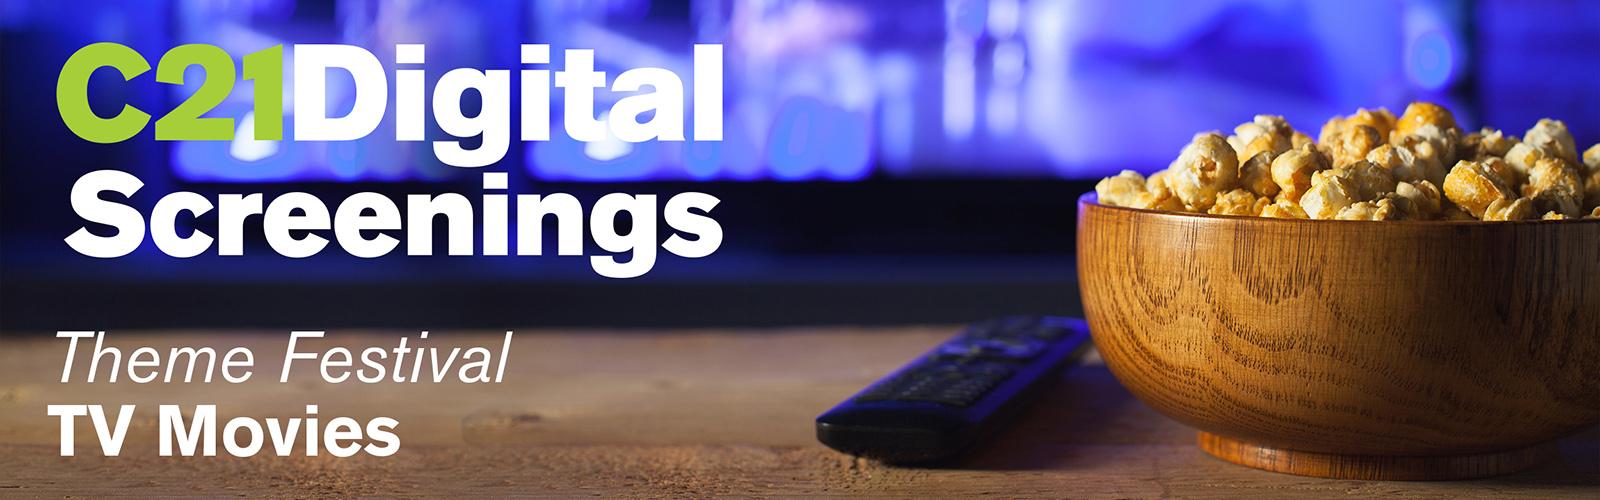 Theme Festival - TV Movies